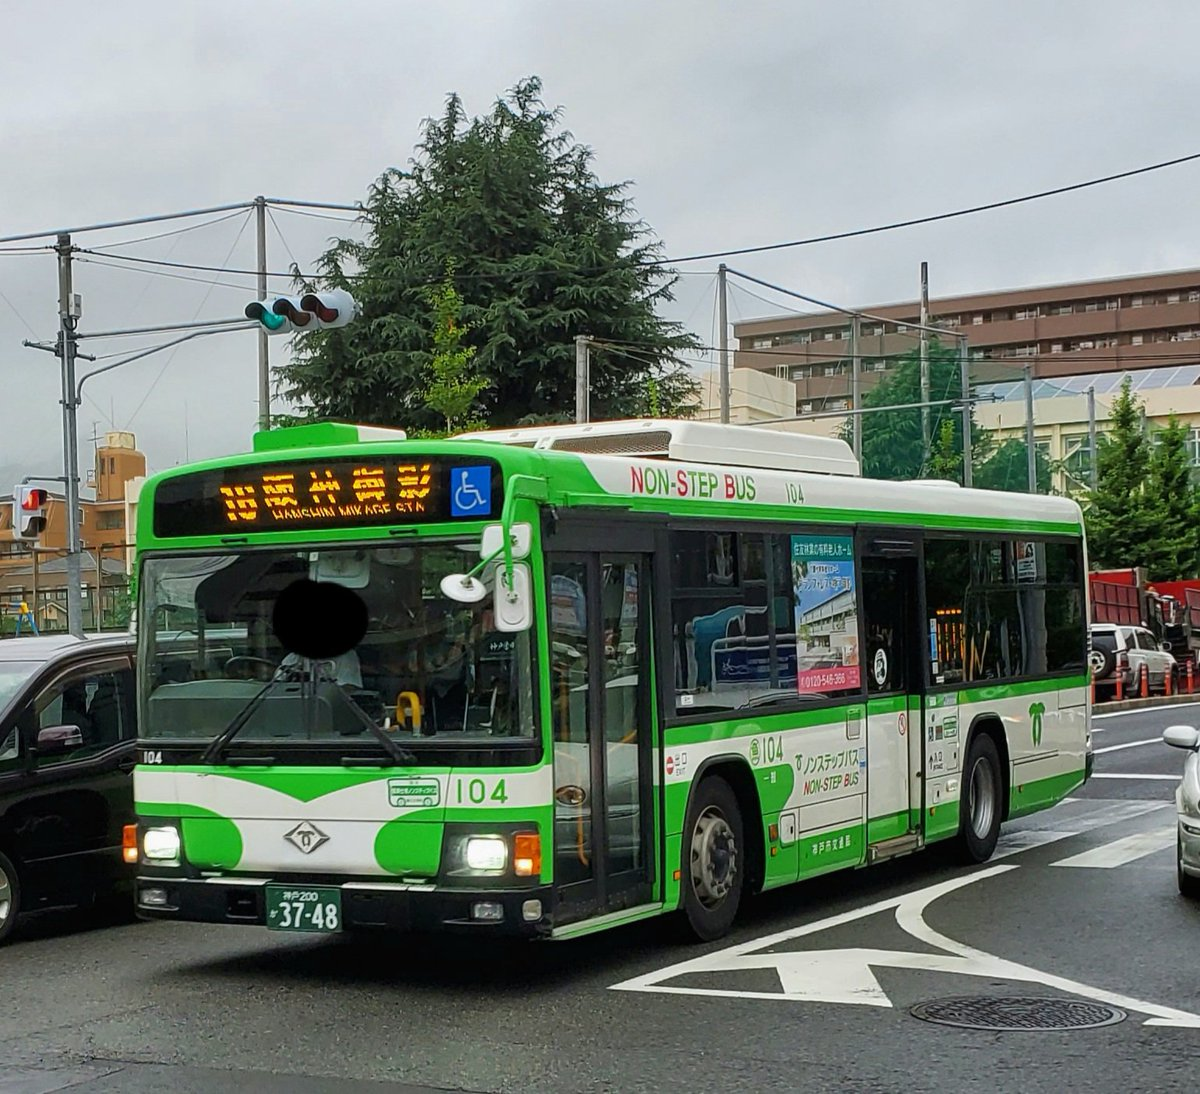 test ツイッターメディア - 神戸市バス/魚崎104 2011年式 LKG-KV234L3 16系統 阪神御影 4月以降は主に甲南山手発着路線での運用が多い車両です。 2020.7.4 https://t.co/7FPhzHBaW2